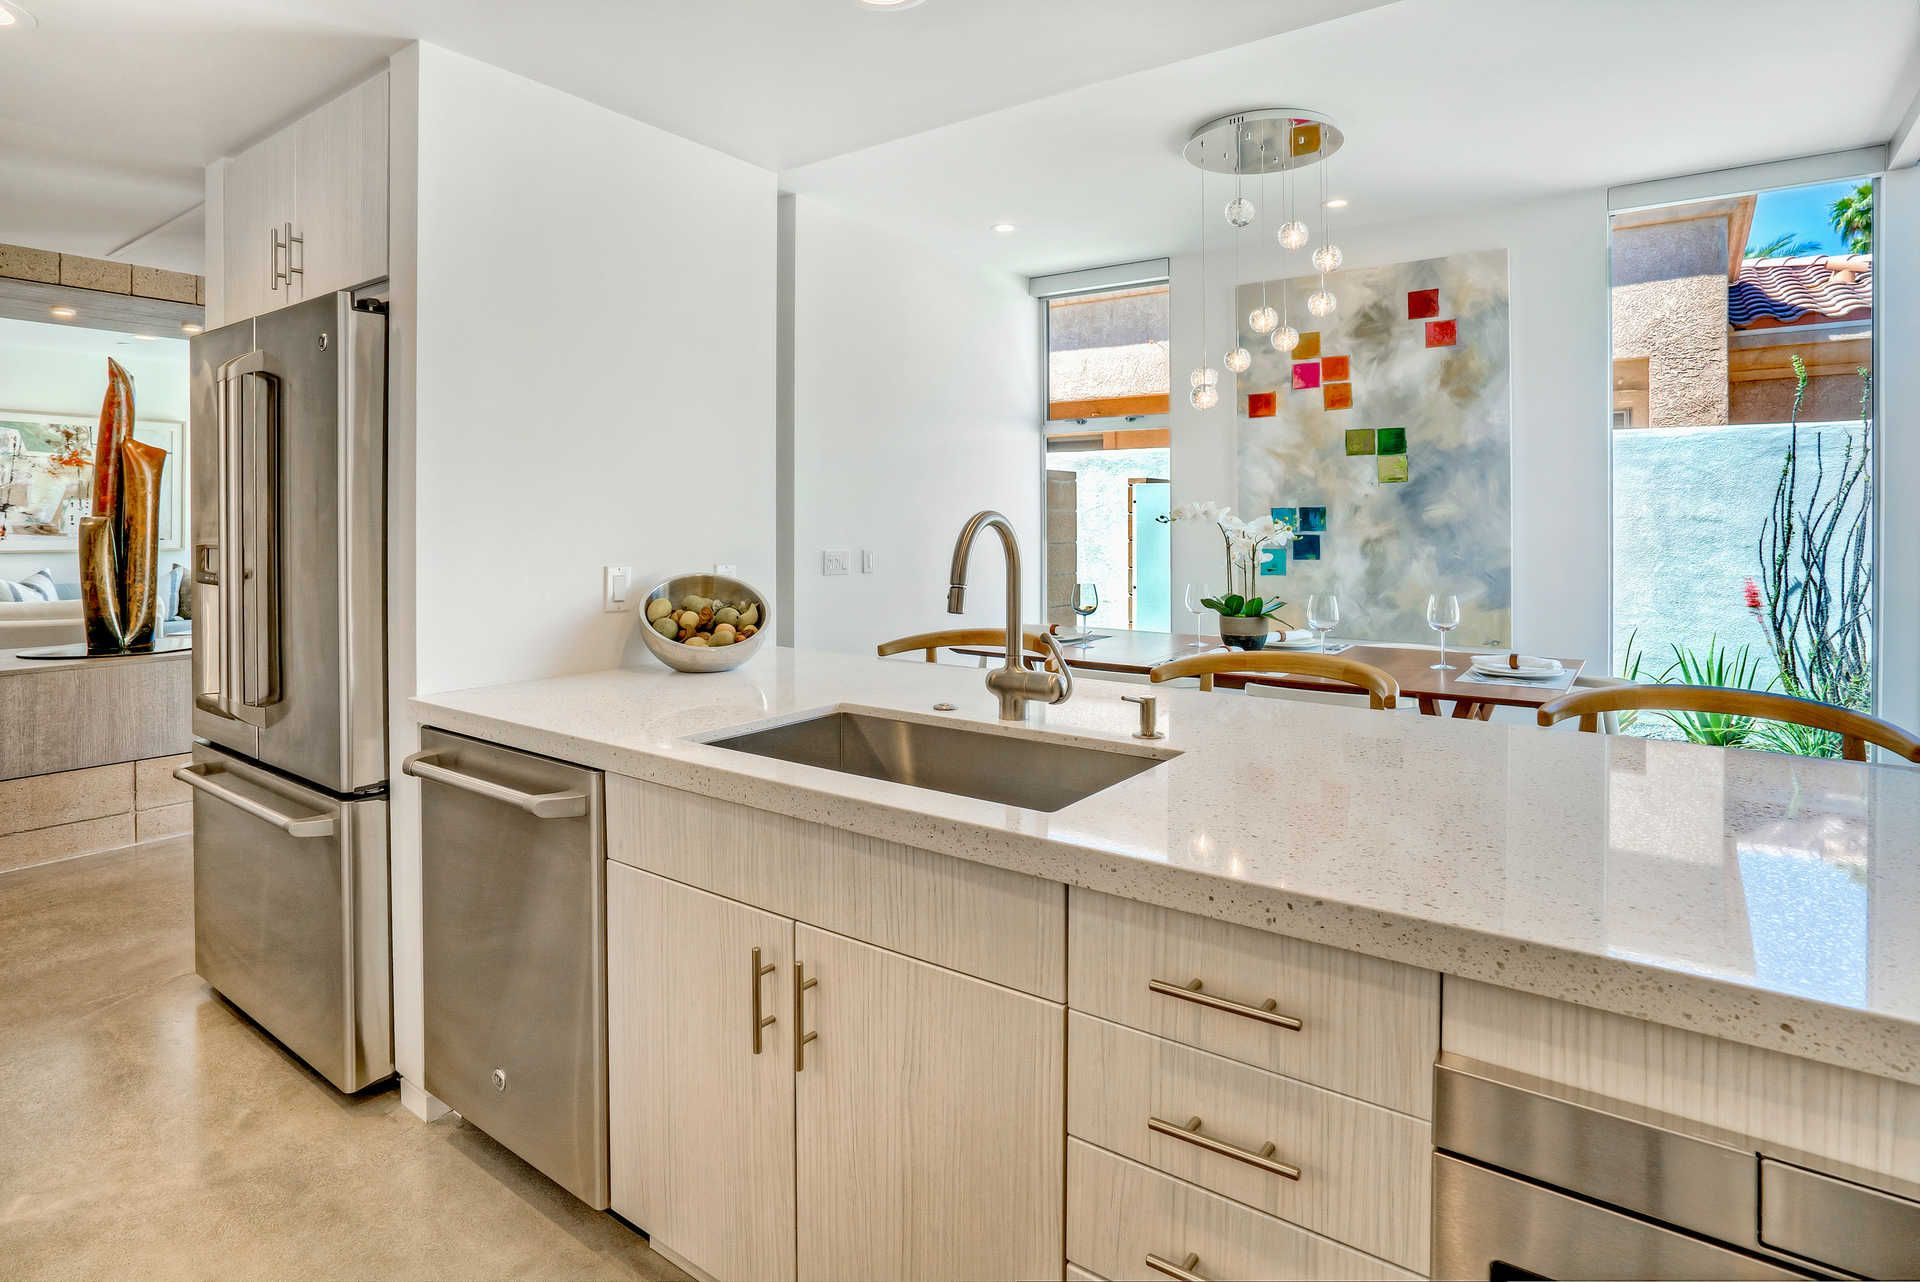 73801 Shadow Mountain Dr Palm Desert Built Ins Kitchen Energy Efficient Lighting